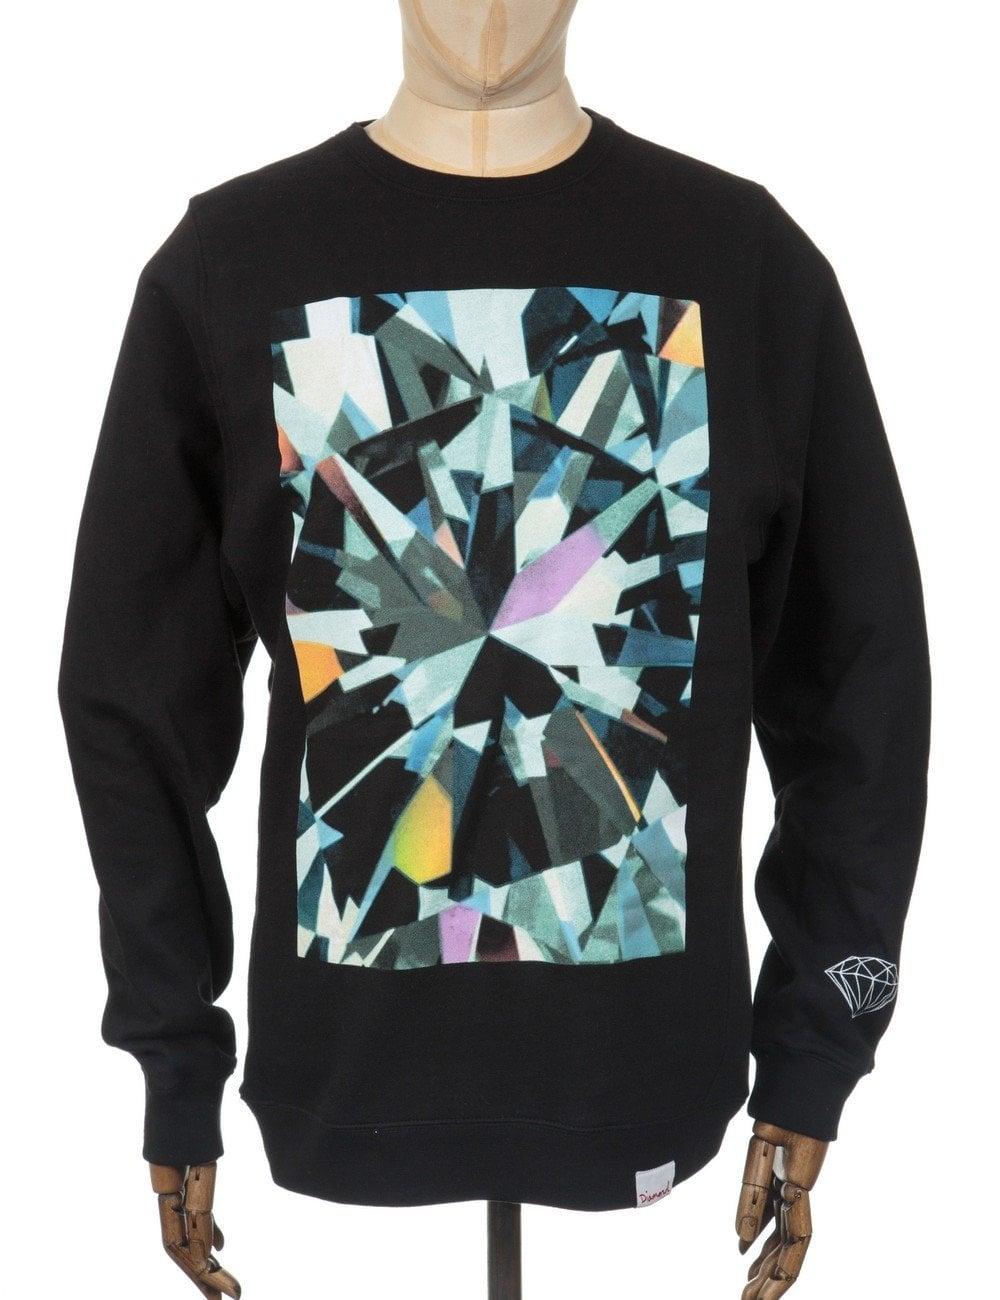 092a0f9a1bf1 Simplicity Box Sweatshirt - Black Sale · Diamond Supply Co ...